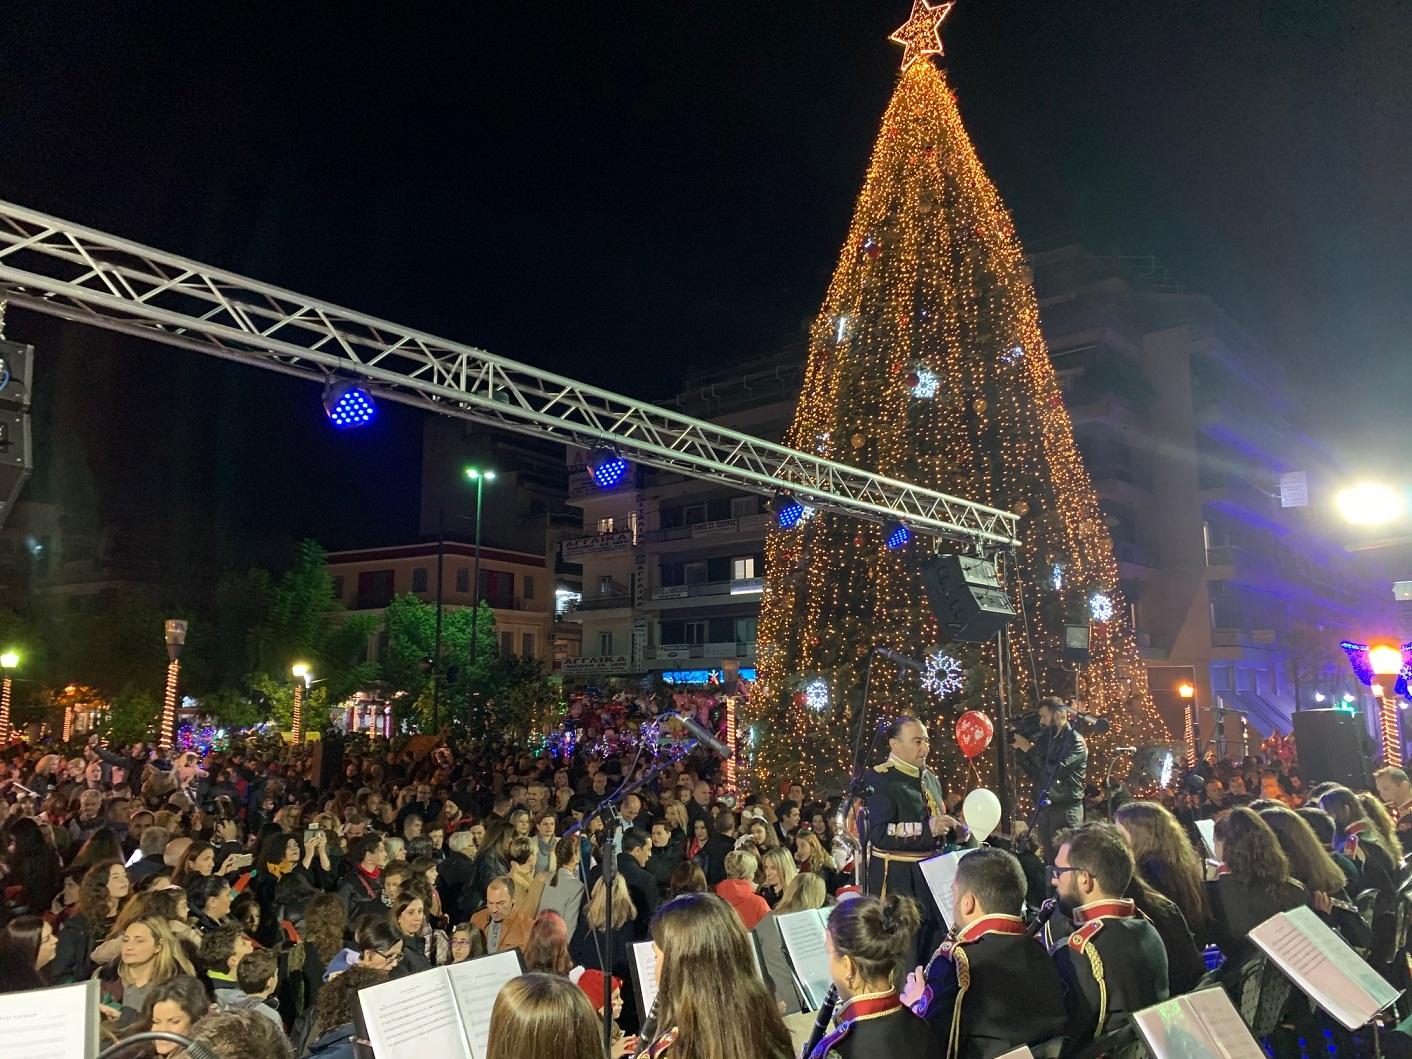 Bίντεο: η φωταγώγηση του Χριστουγεννιάτικου Δένδρου στο Αγρίνιο